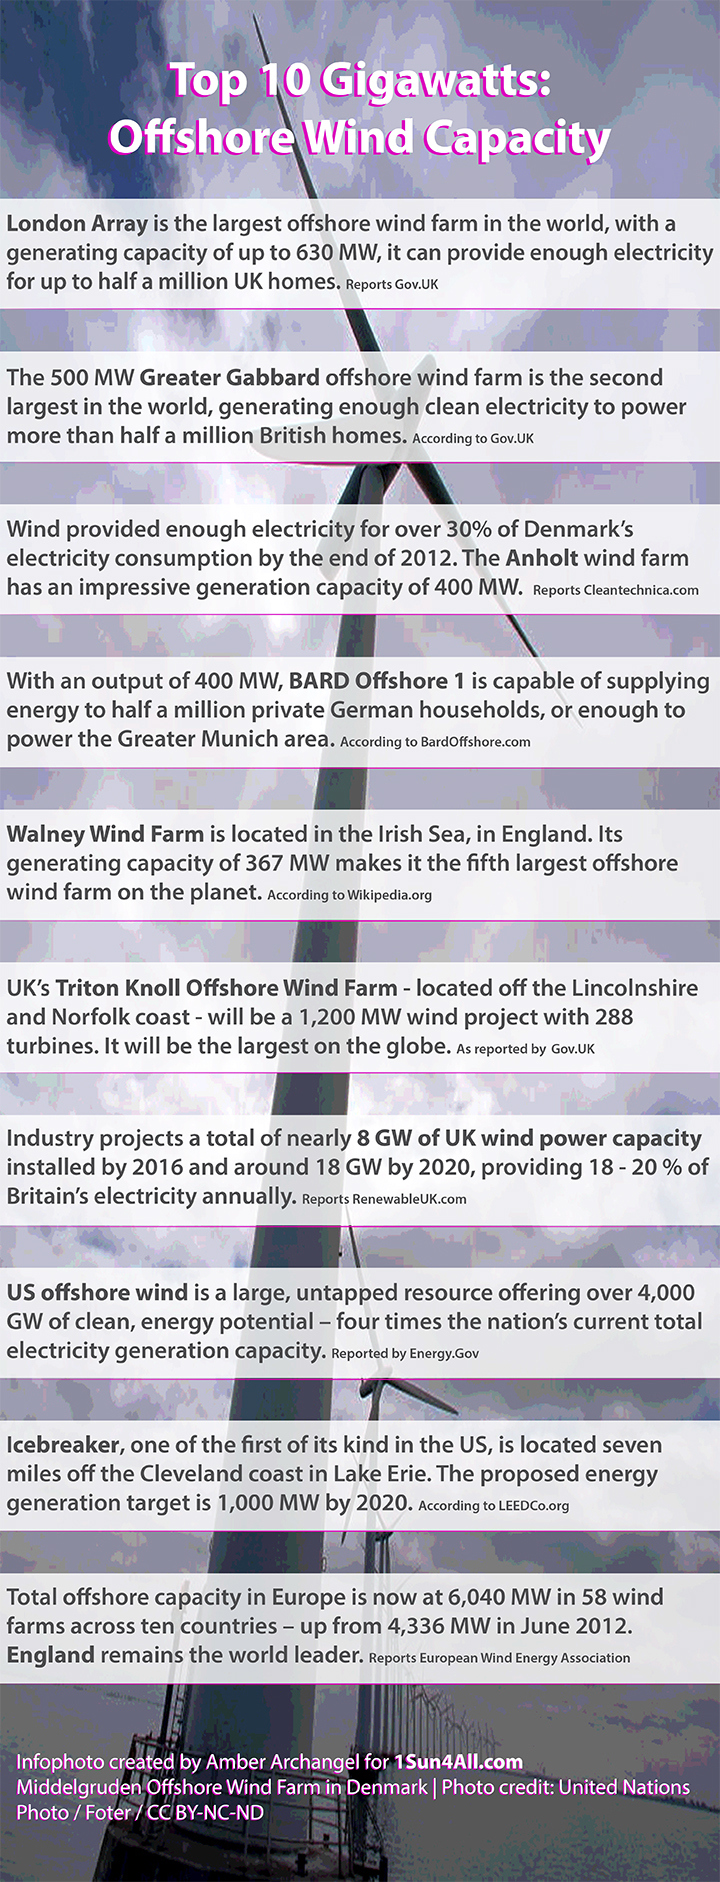 https://www.evwind.es/wp-content/uploads/2013/09/offshore-wind-farm-Final-2.jpg